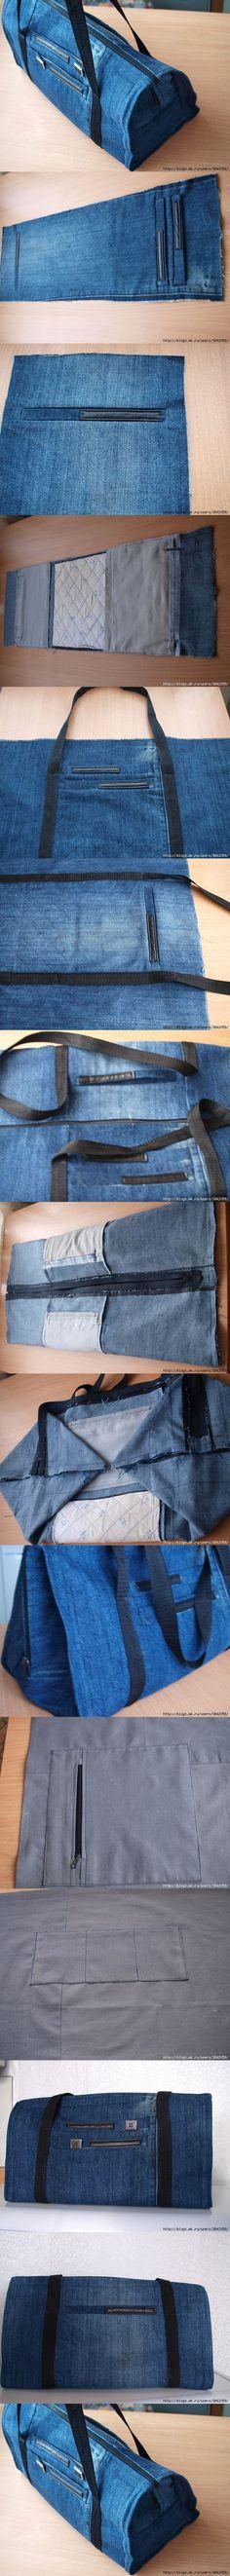 DIY Cool Handbag from Old Jeans | www.FabArtDIY.com LIKE Us on Facebook ==> https://www.facebook.com/FabArtDIY